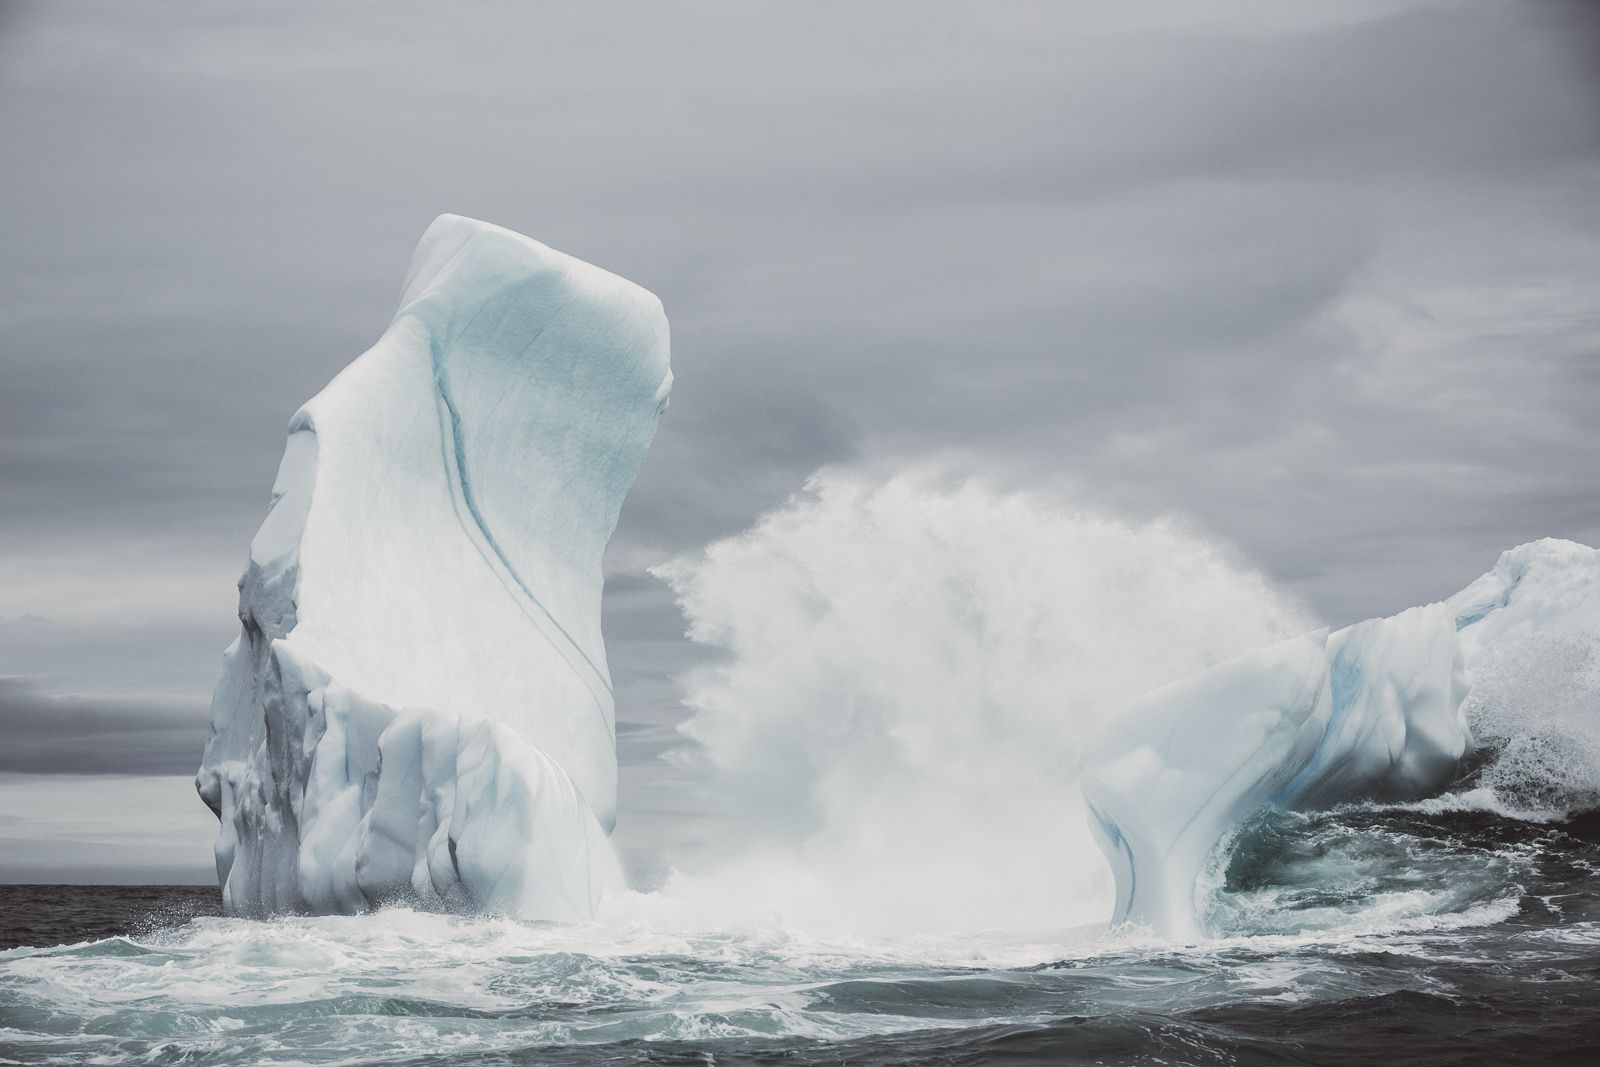 Newfoundland Icebergs